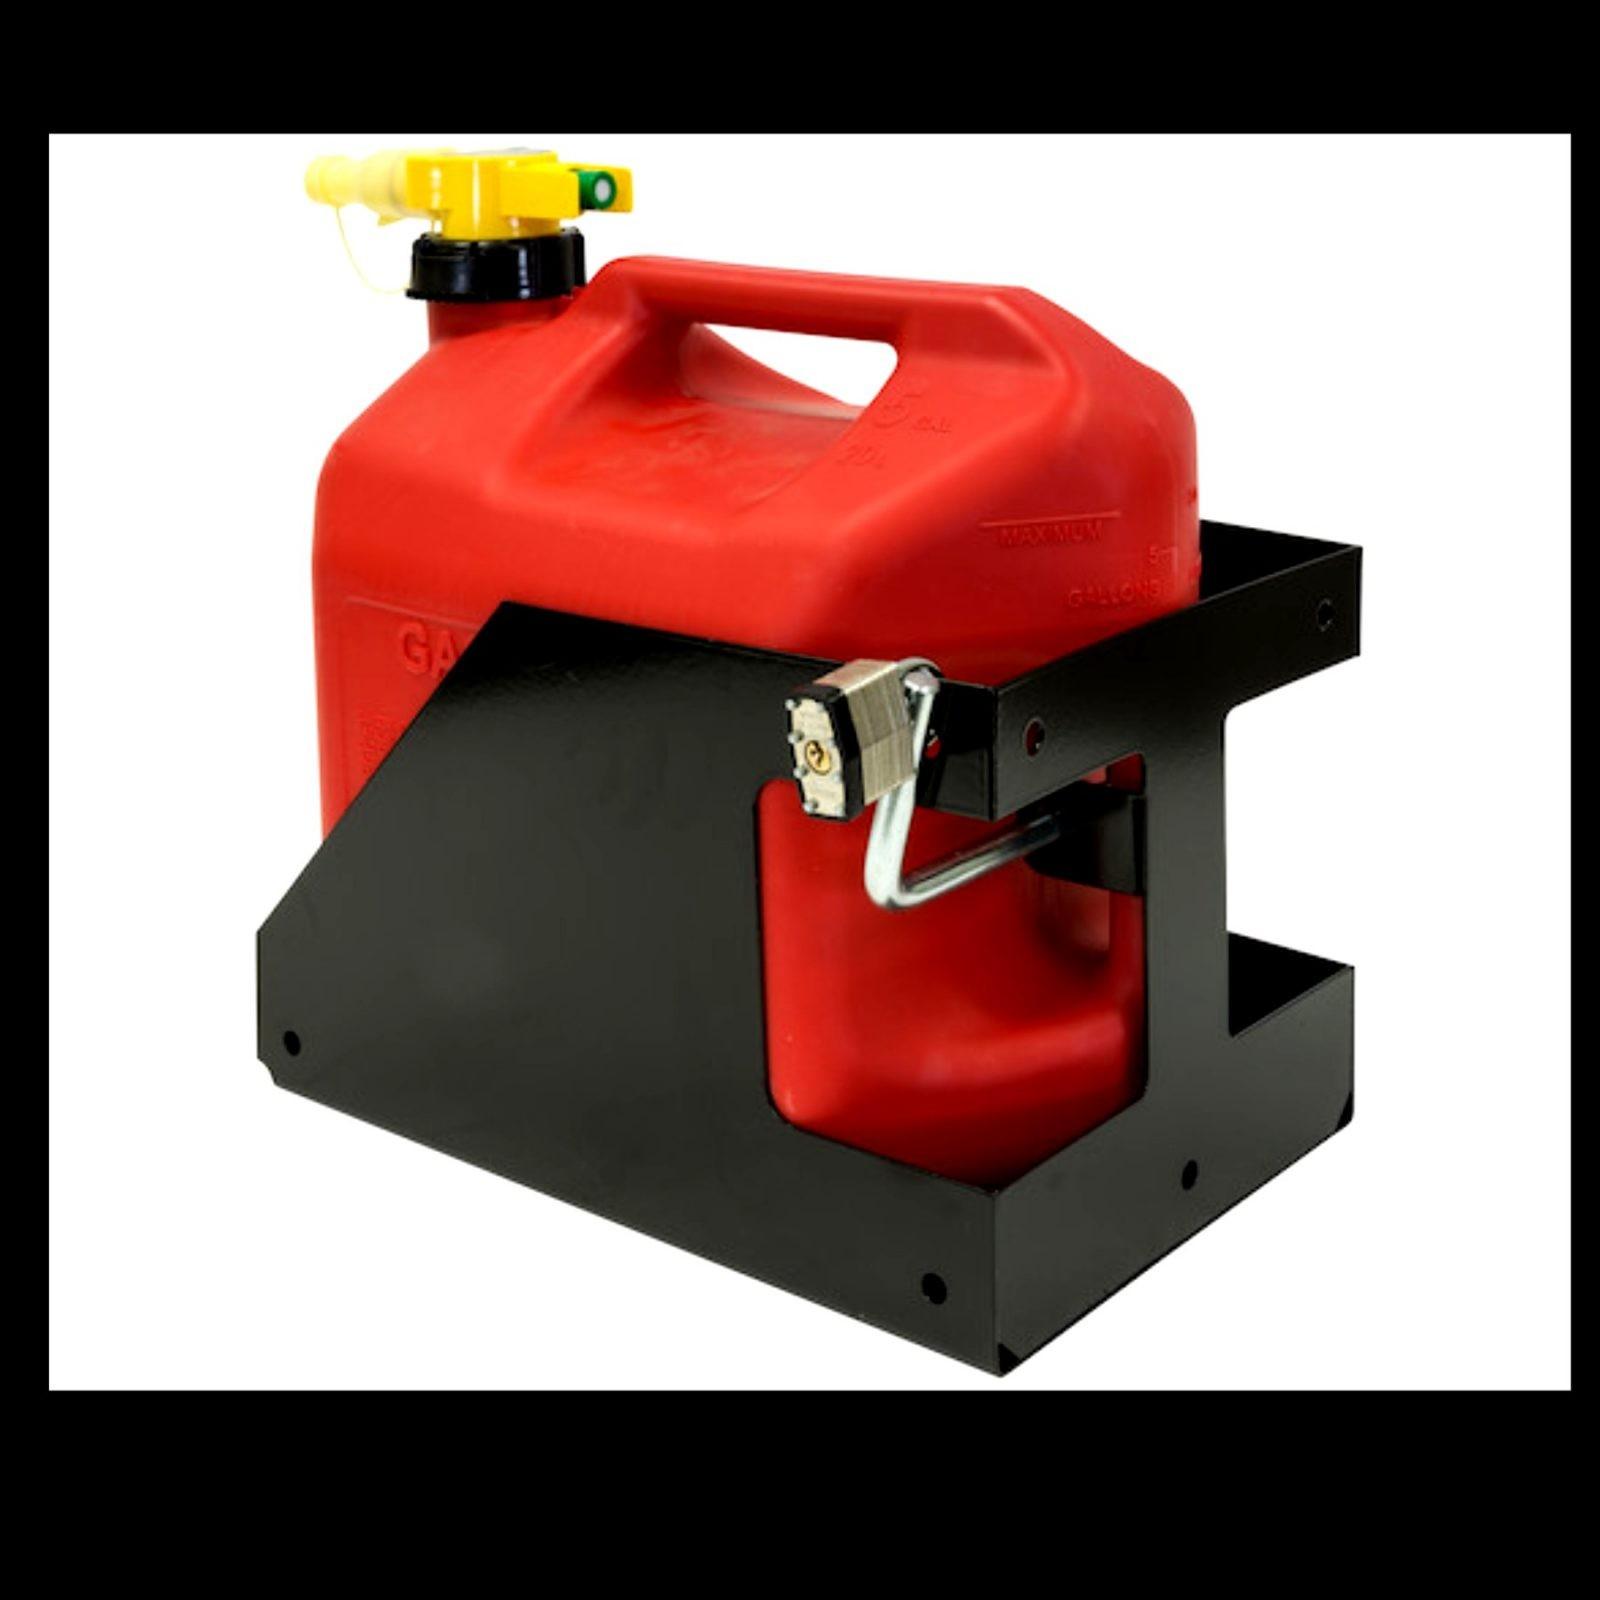 Buyers LT32 Blitz 5-Gallon Poly Gas Can Landscape Truck /& Trailer Locking Rack